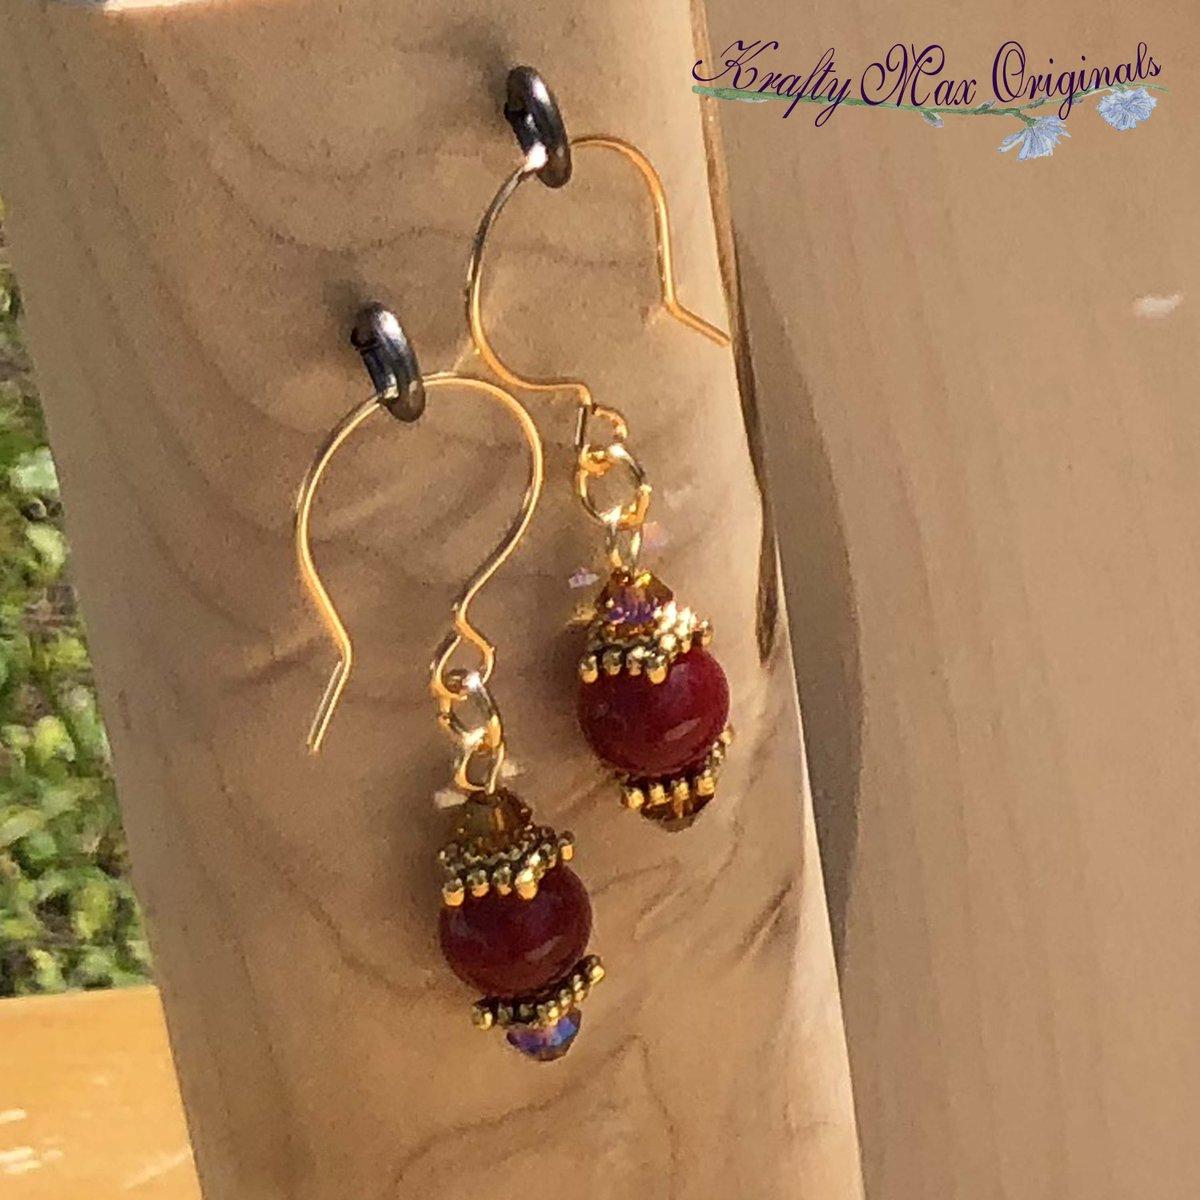 Warm Red/Orange Gemstone Necklace Set with Swarovski Crystals $43  #handmade #jewelry #supporthandmade #buyhandmade #handmadelove #jewelrydesigner #jewelryart #uniquejewelry #handcrafted #kraftymax #kmax